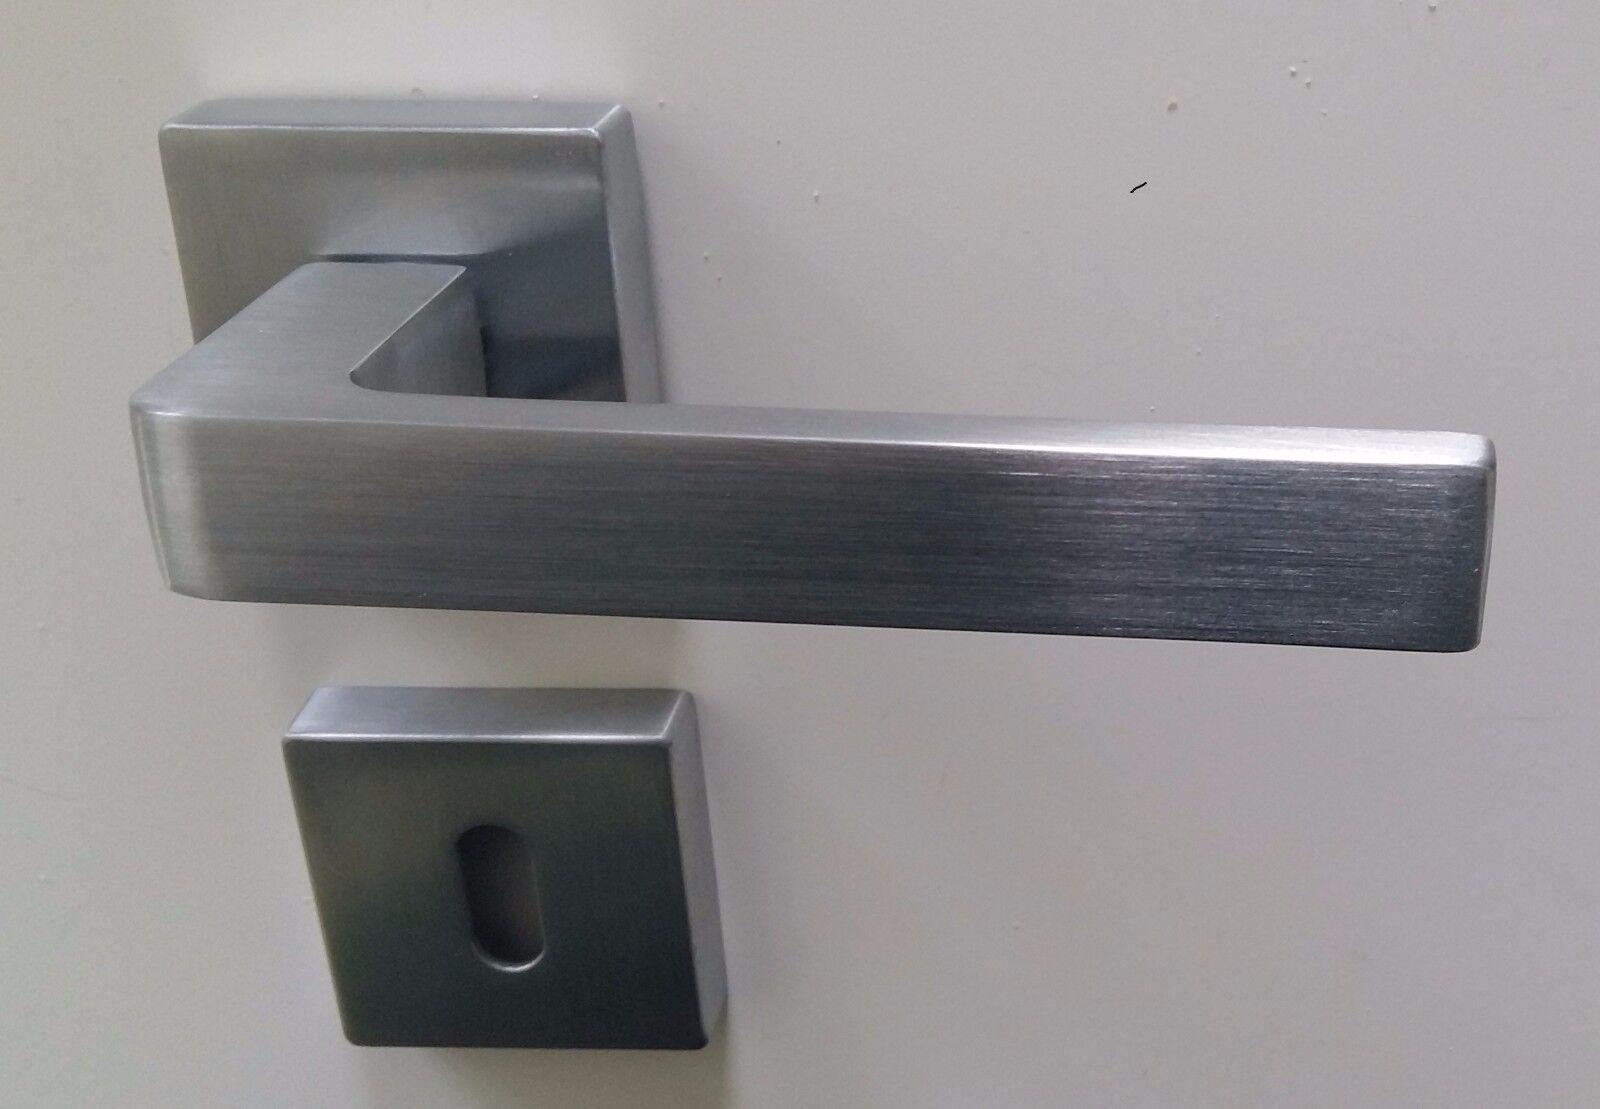 Maniglie per porte interne quadrate moderne cromo satinato e cromo lucido